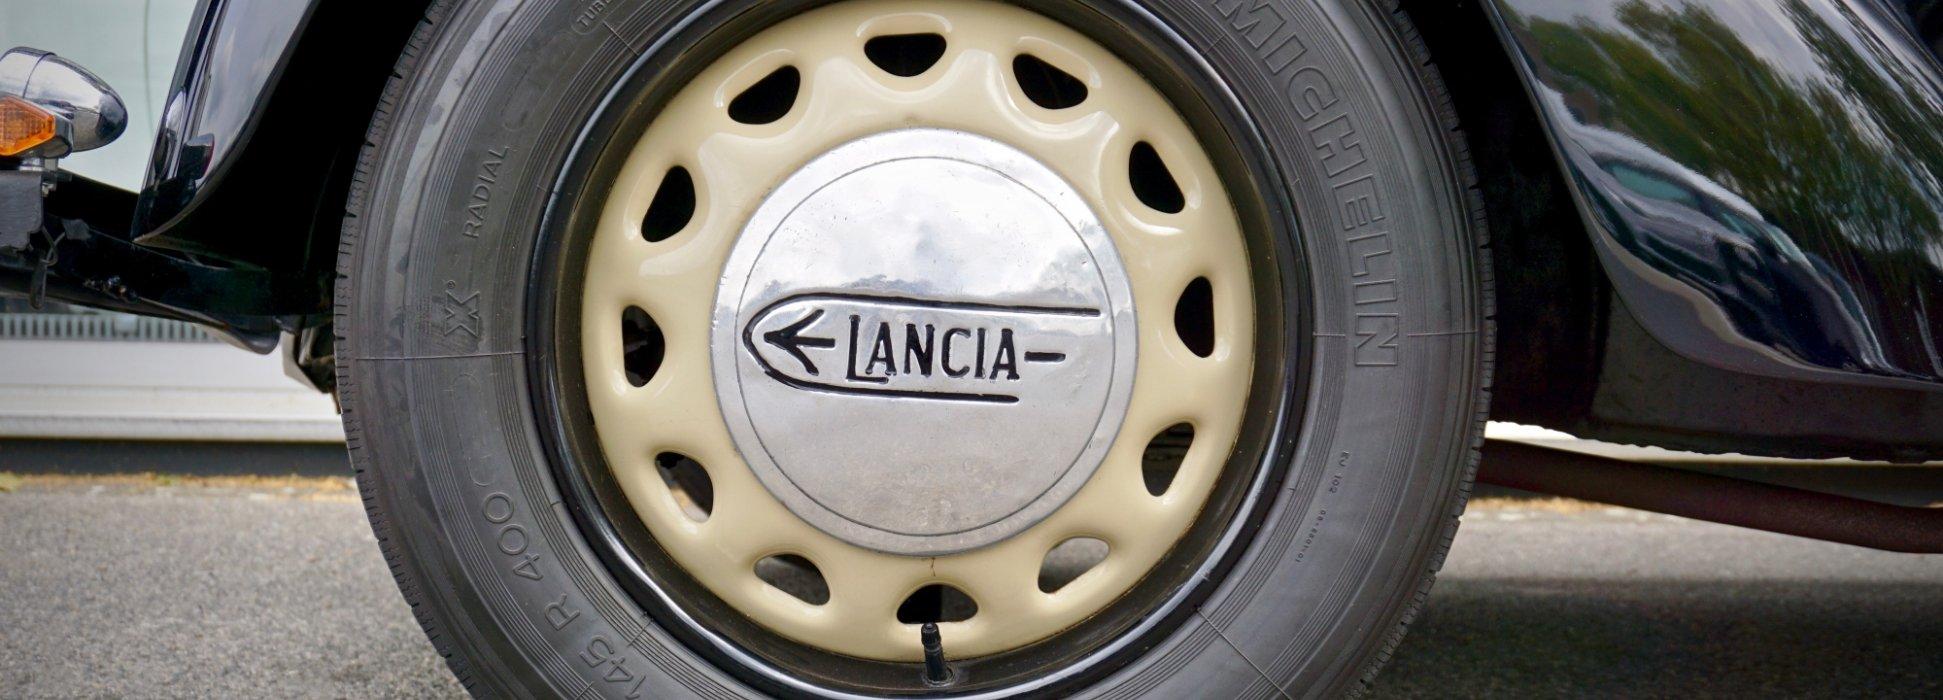 Lancia Ardea 250 Berlina 1